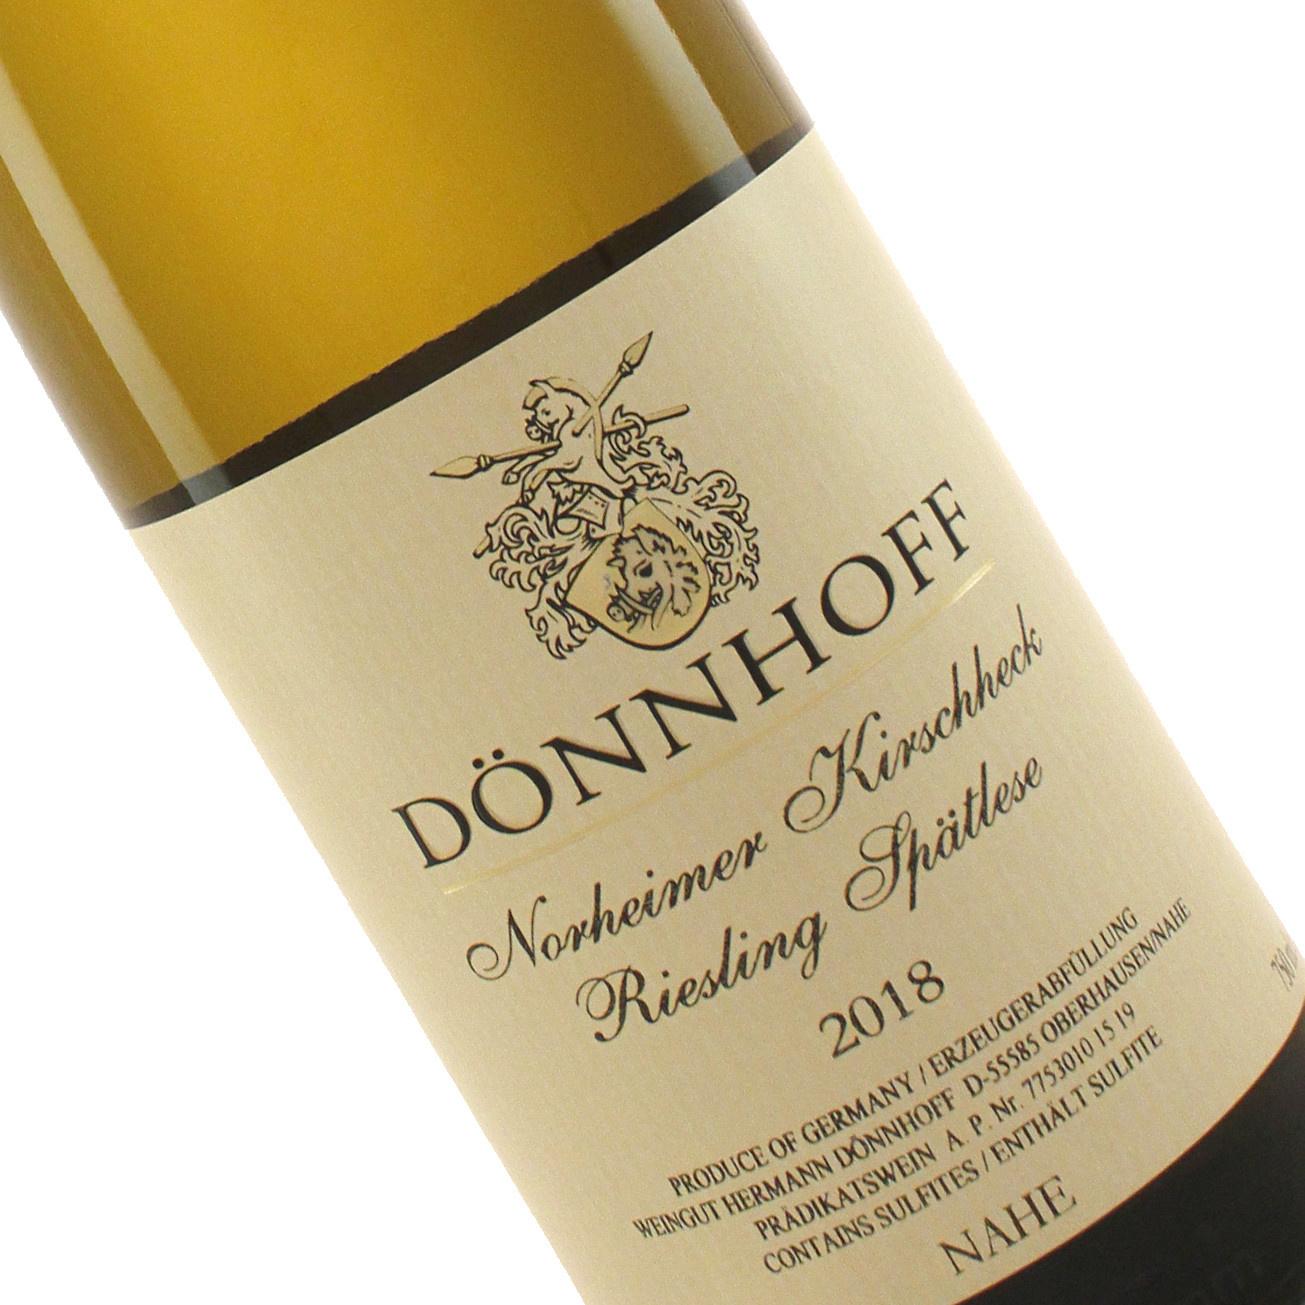 Donnhoff 2018 Riesling Spatlese Norheimer Kirschheck, Nahe